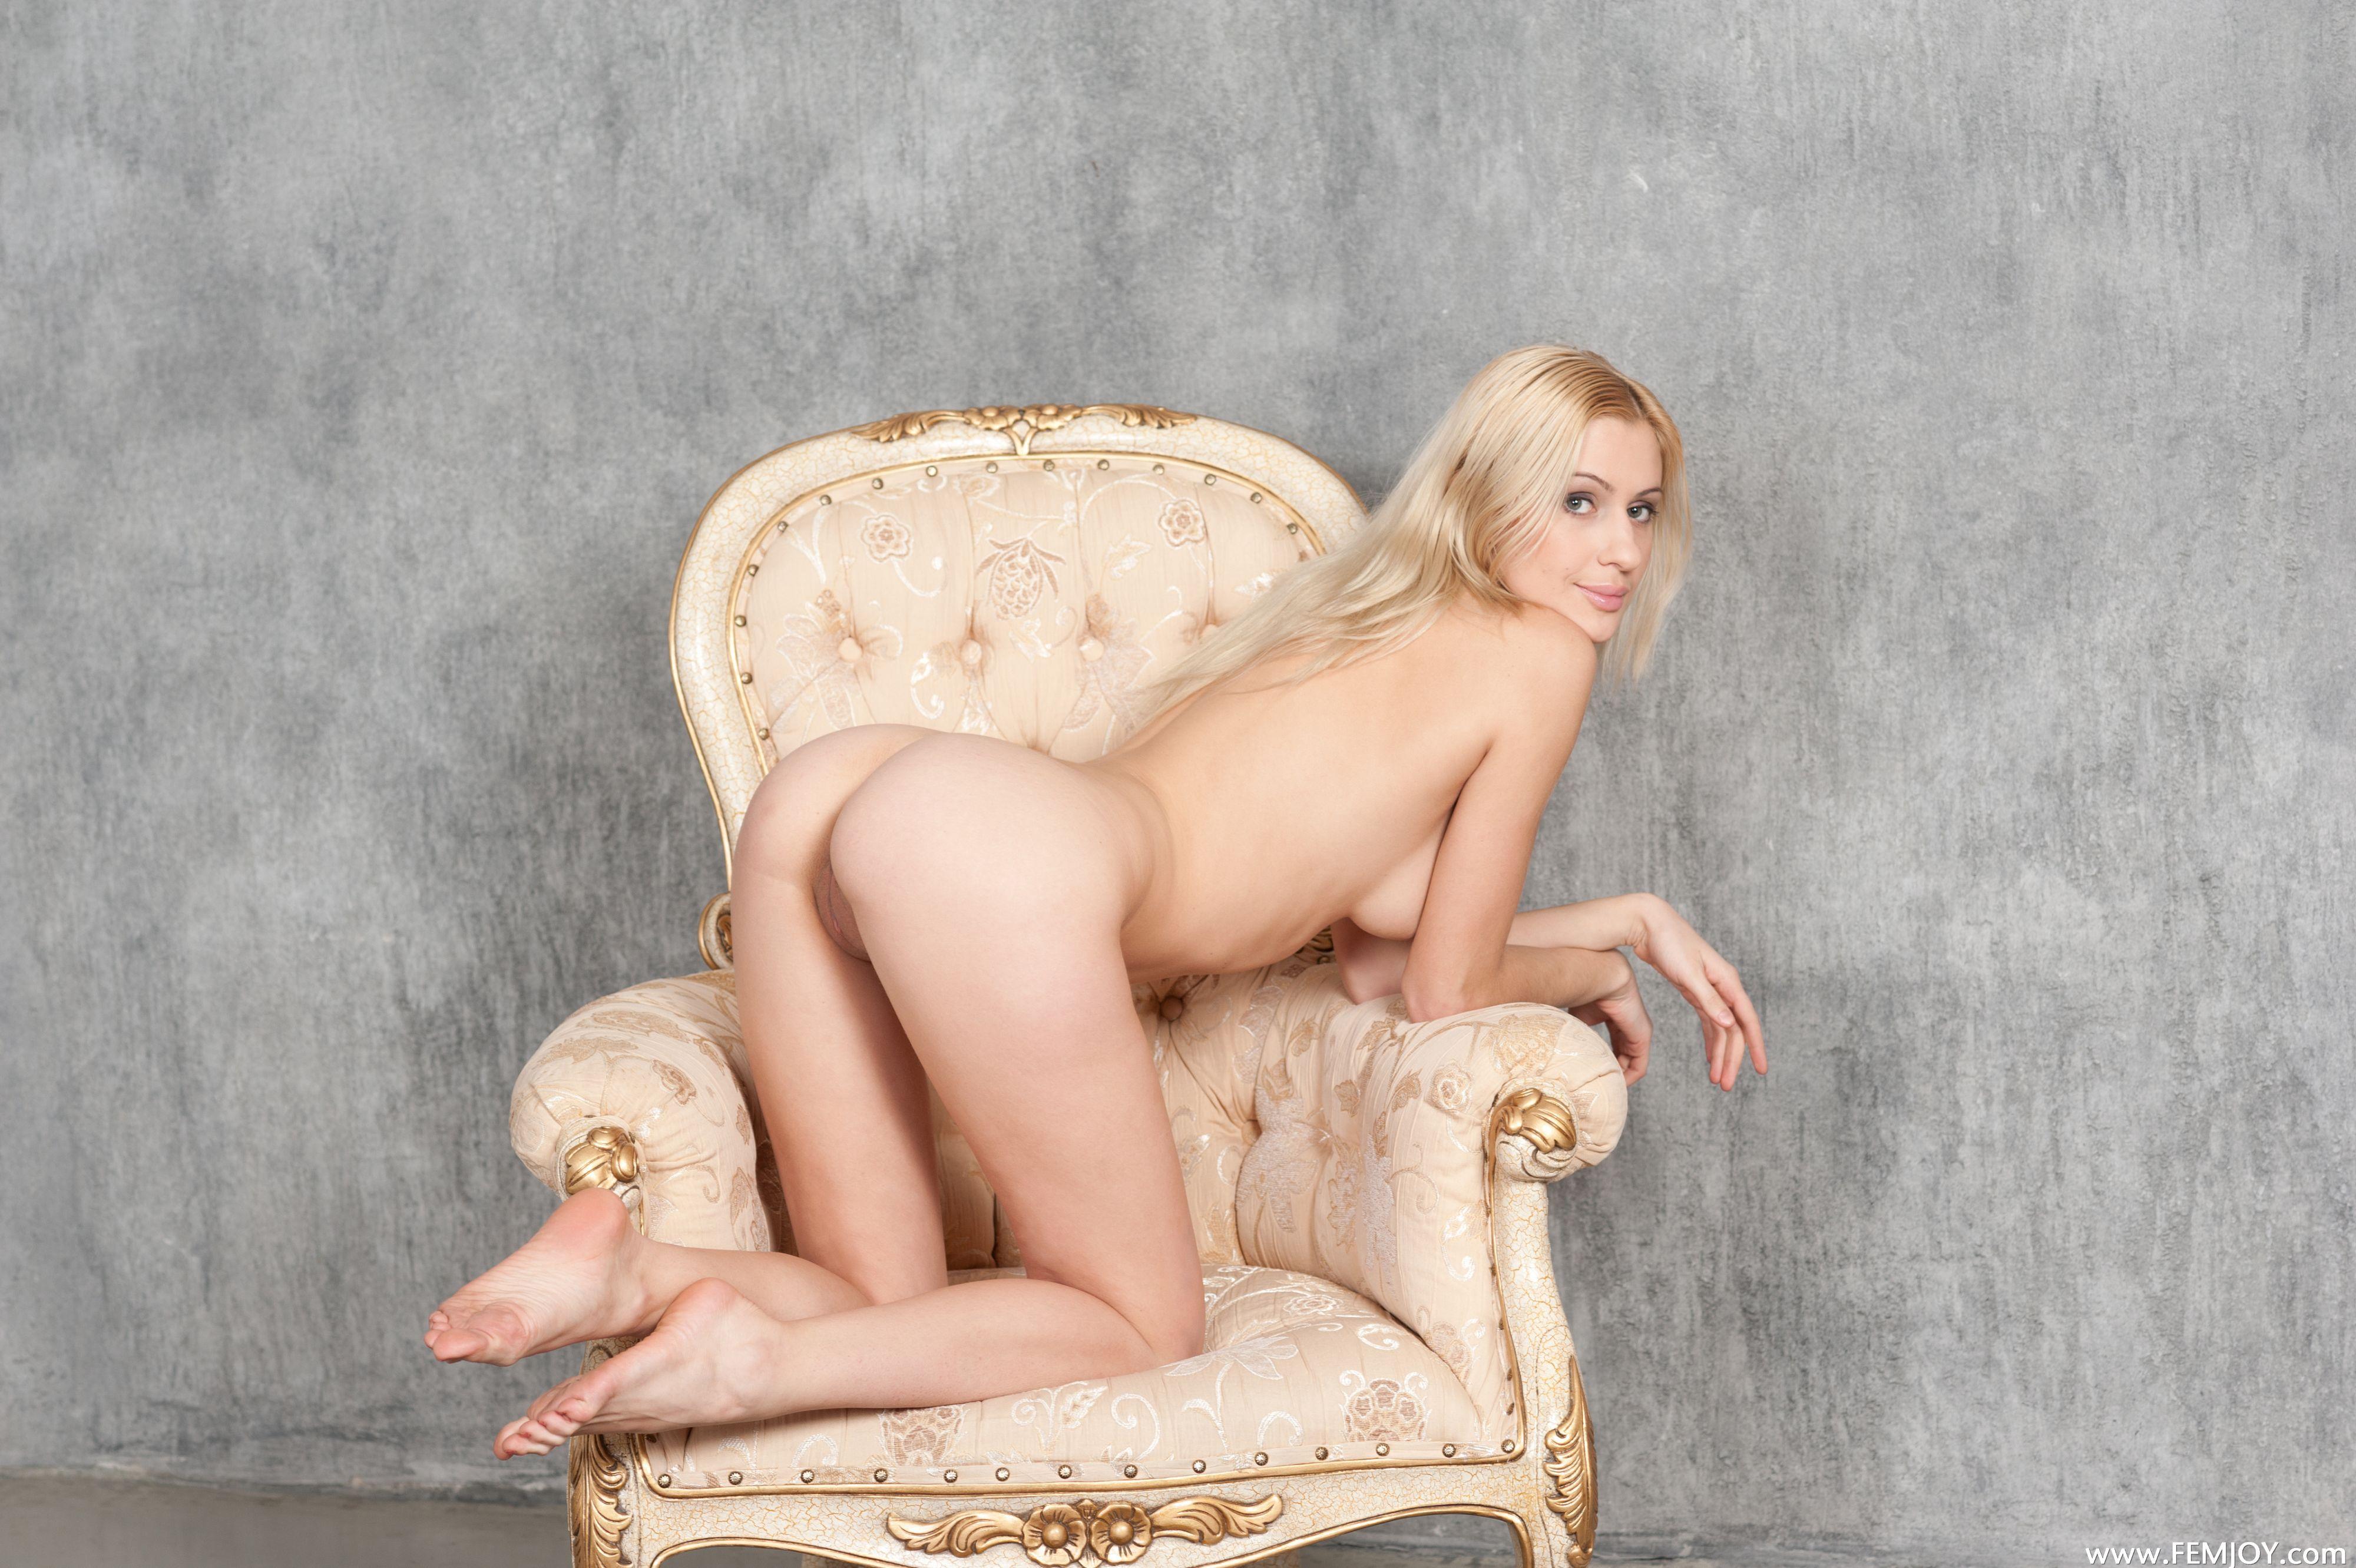 http://i1.imageban.ru/out/2013/08/14/d728100862f318cc03c514a129d589f8.jpg